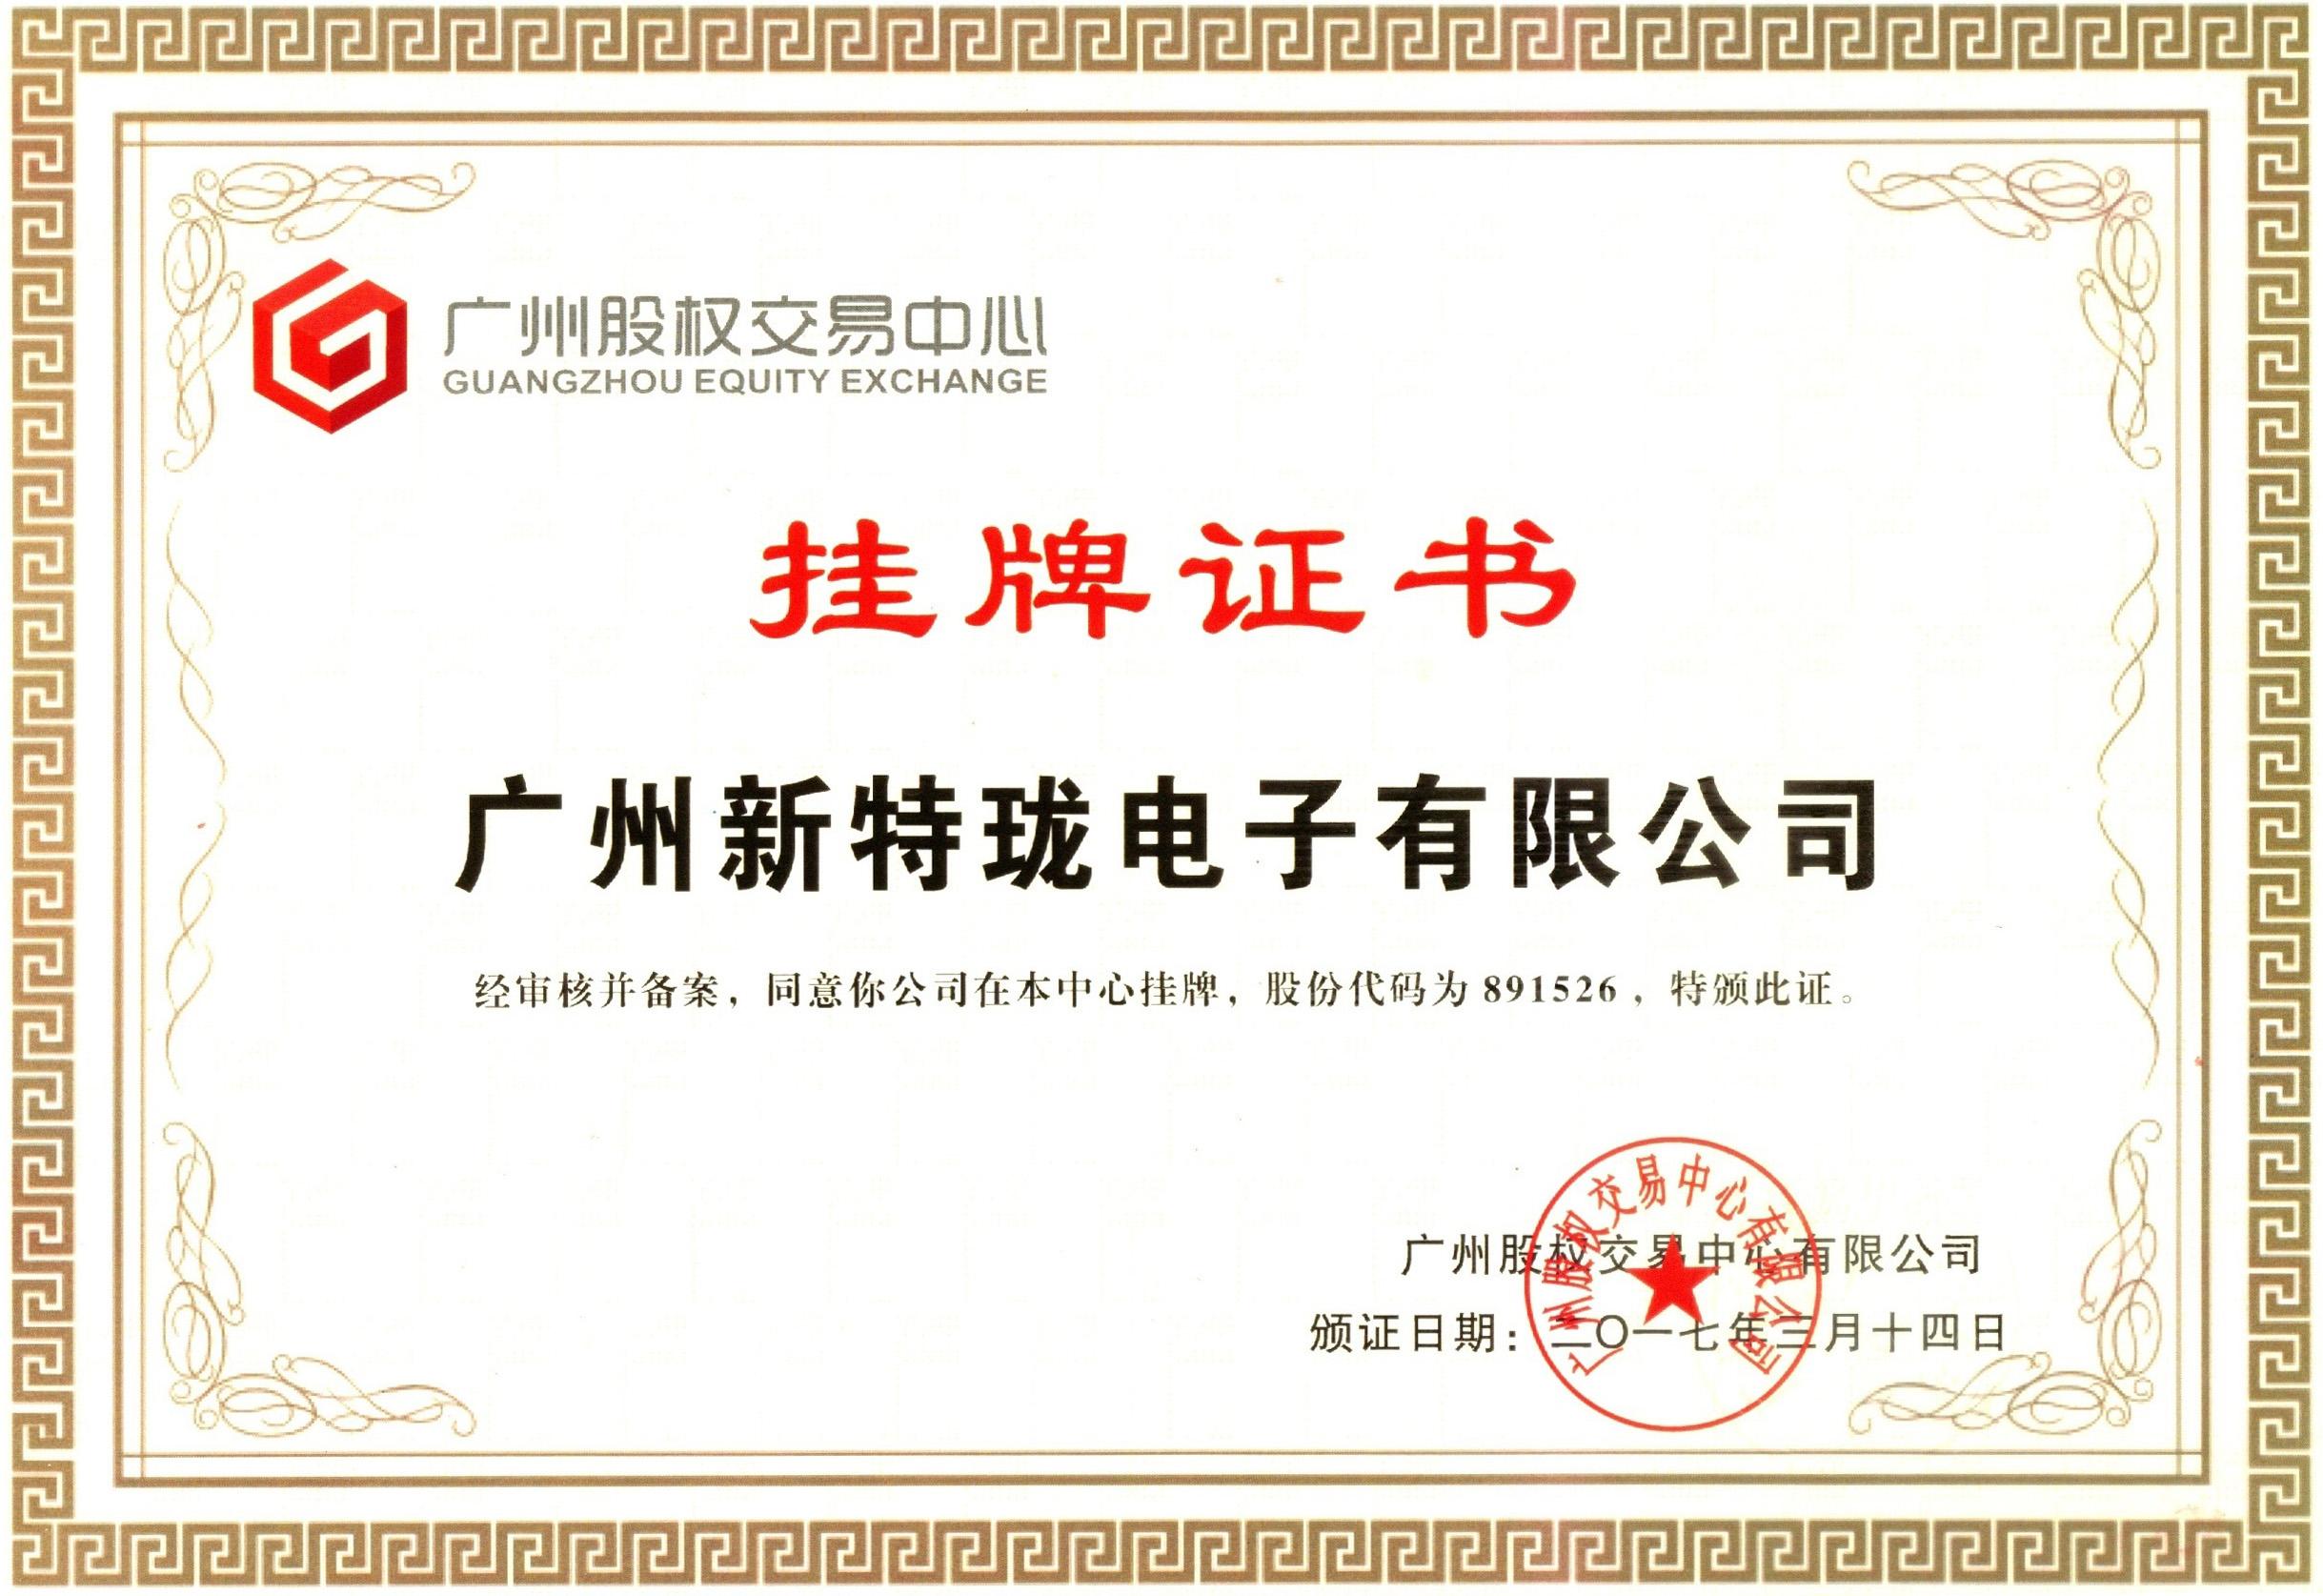 <span>股权交易中心挂牌证书</span>